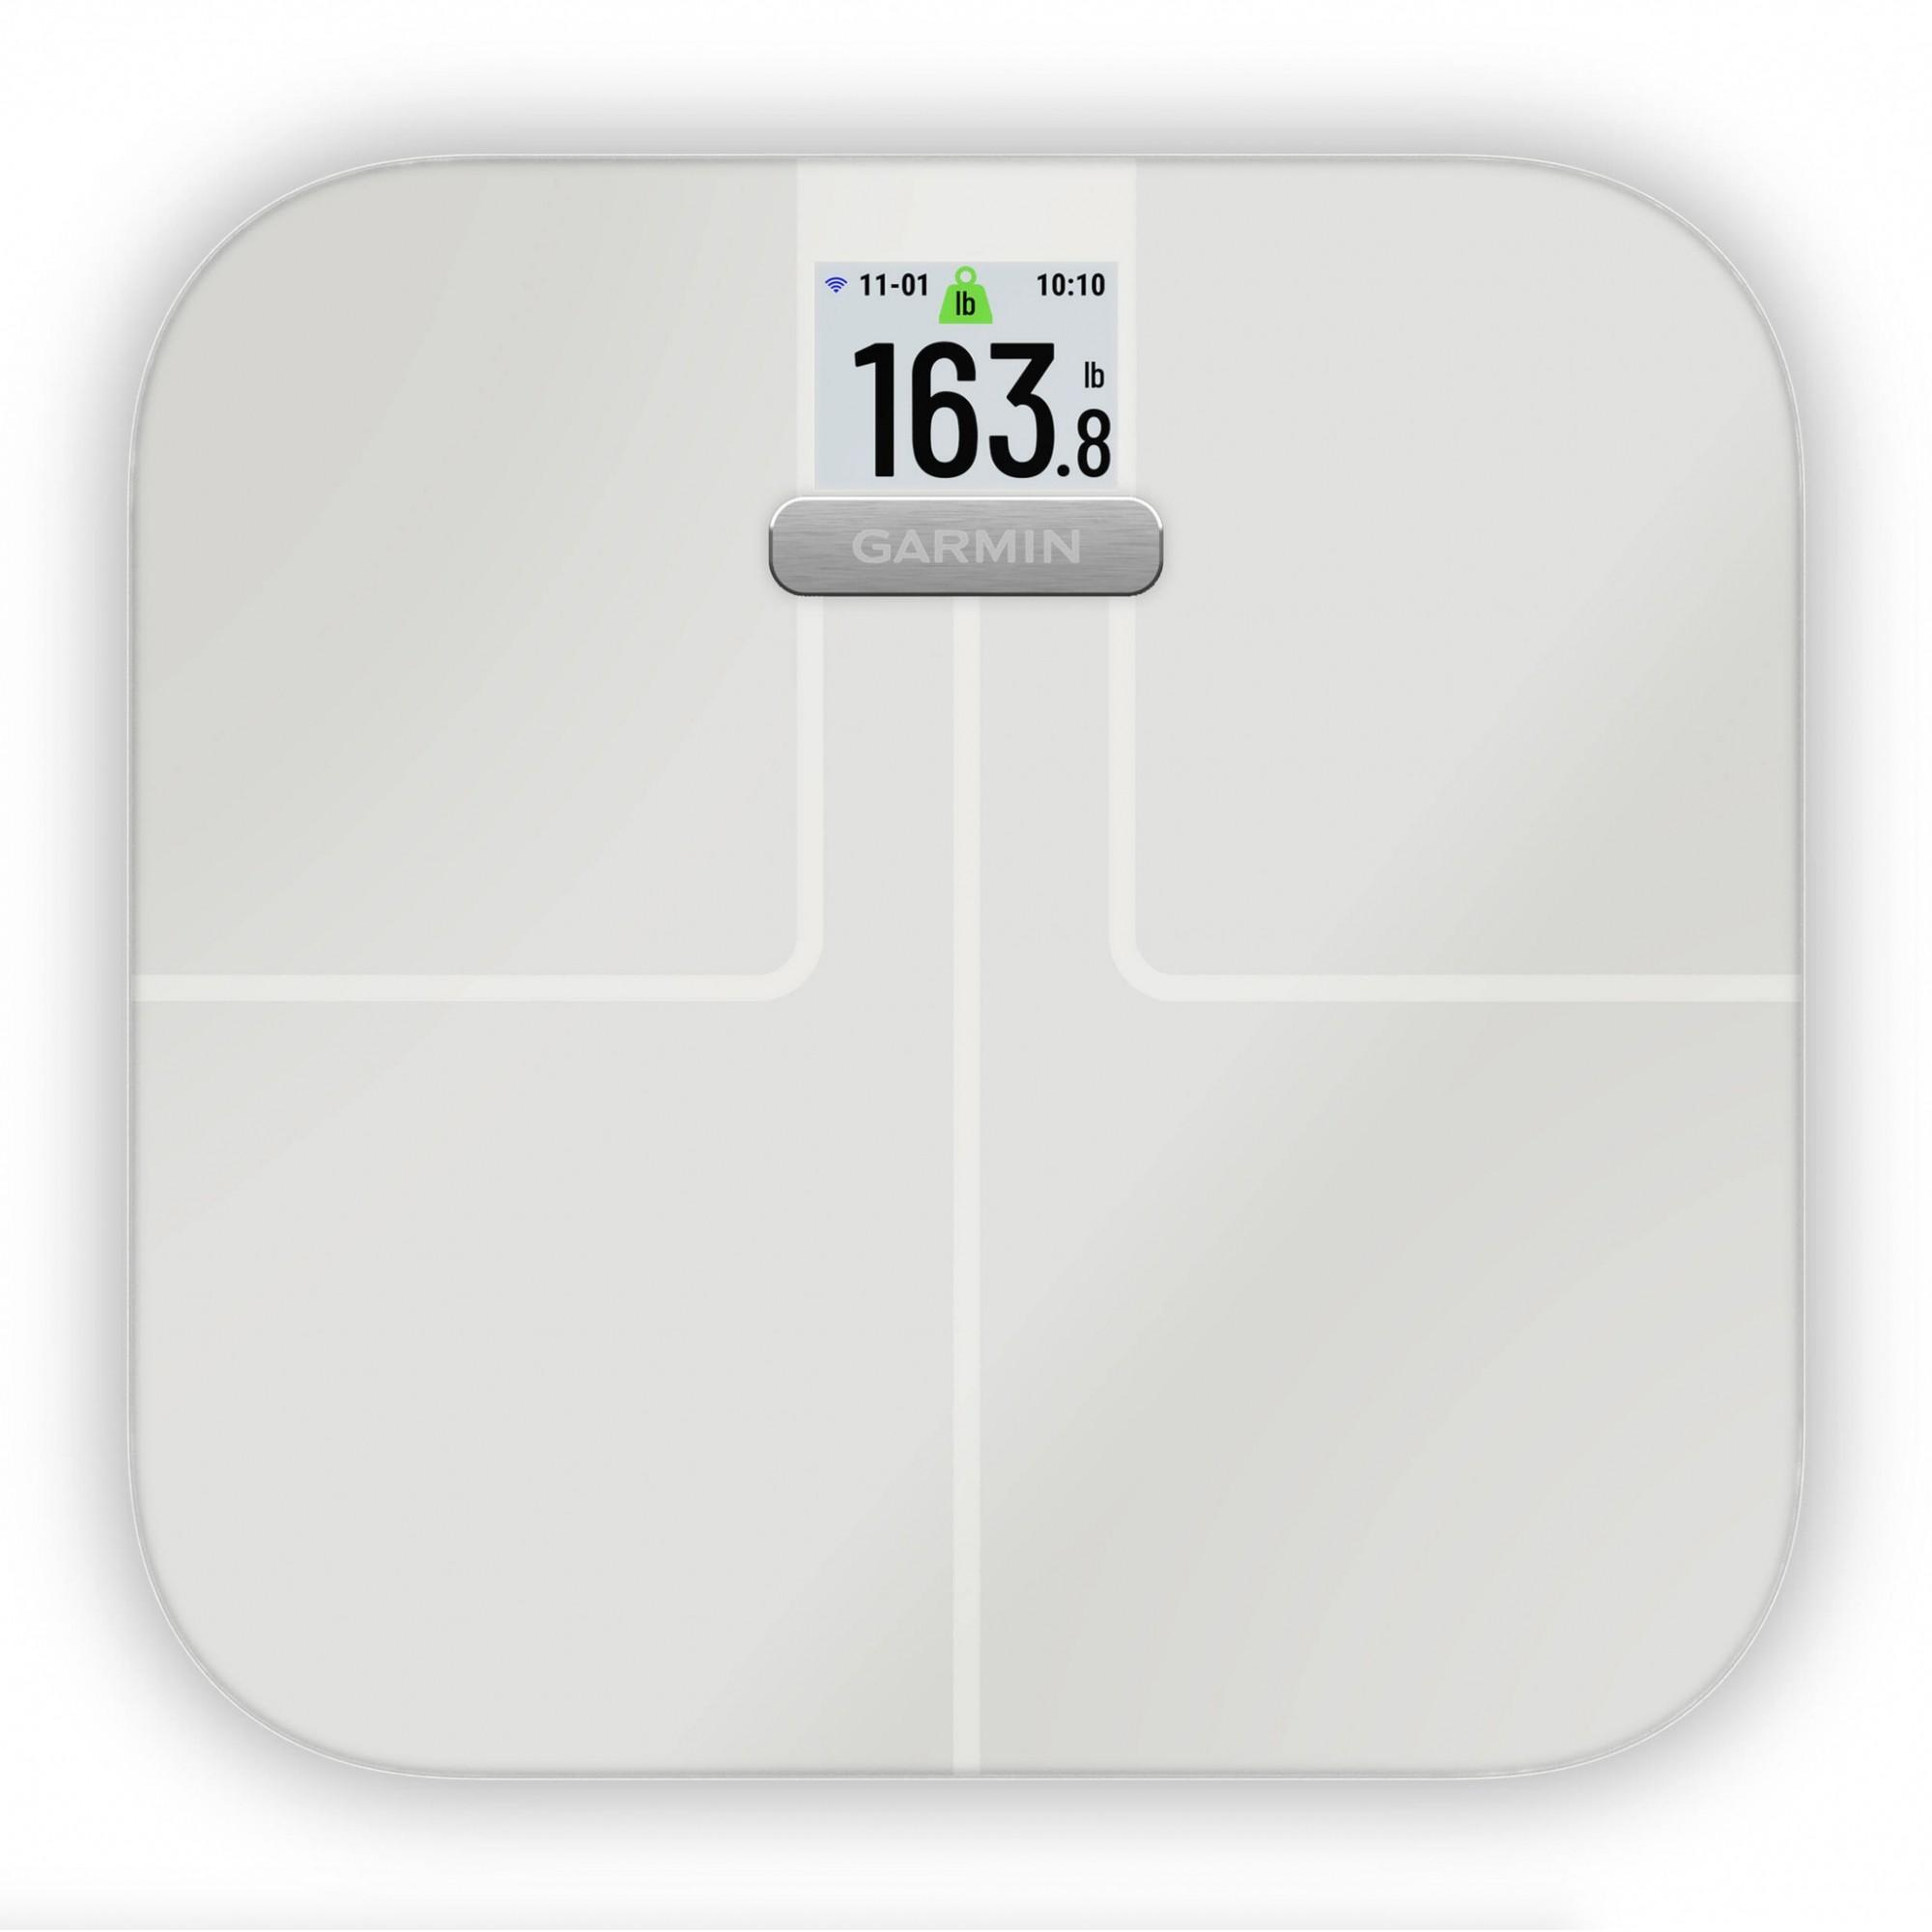 Balança G a r m i n - Inteligente Index S2 - ( White, North America )